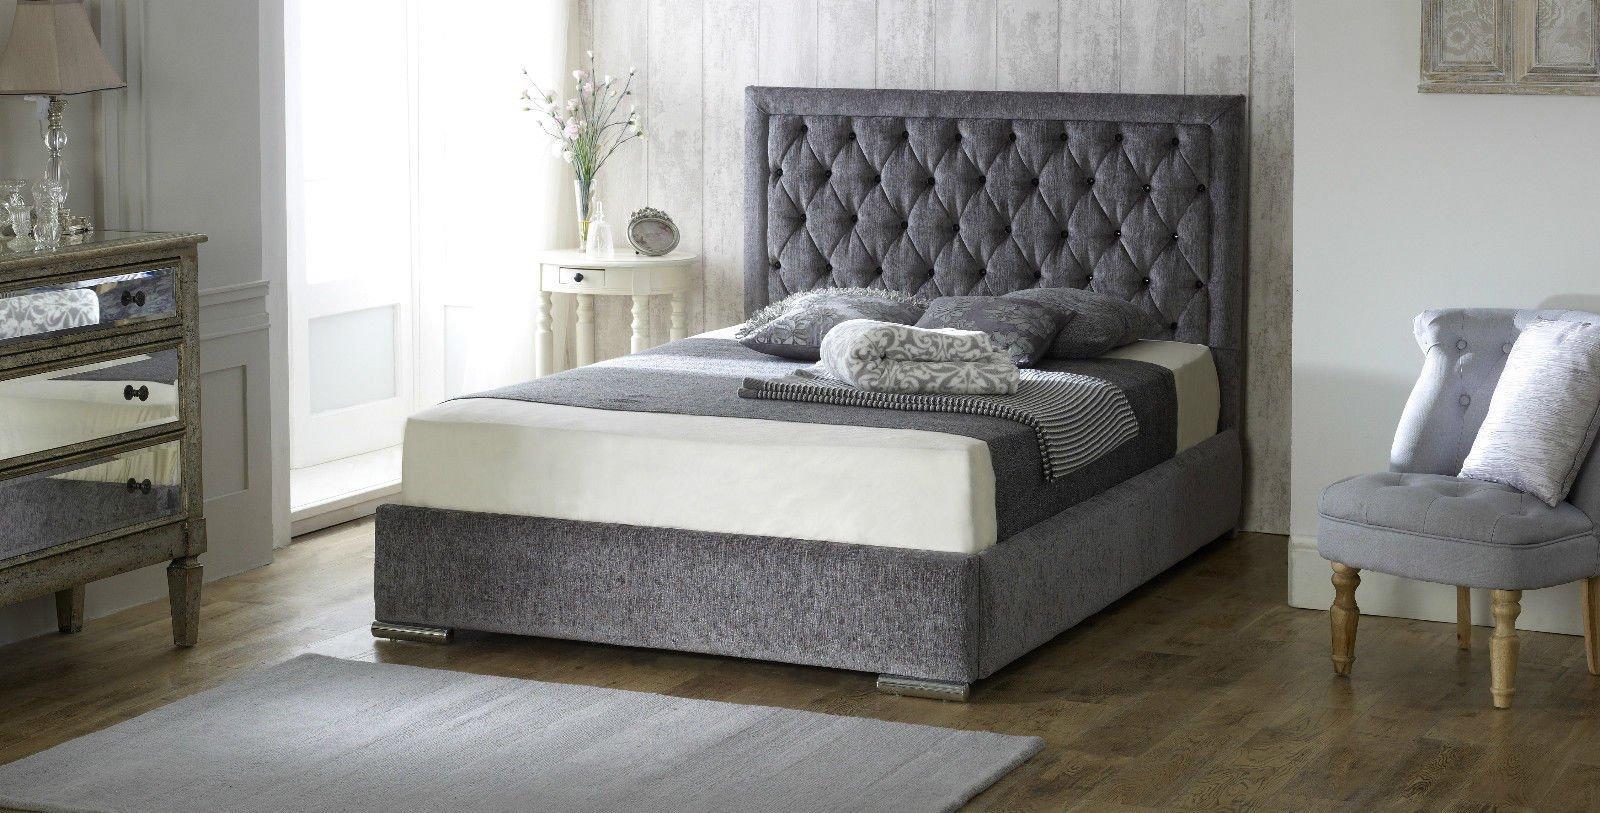 LayLowBeds Luxury Chelsea Chenille Fabric Upholstered Designer Bed Frame  Diamond Cross Hatch Pattern Studded Headboard